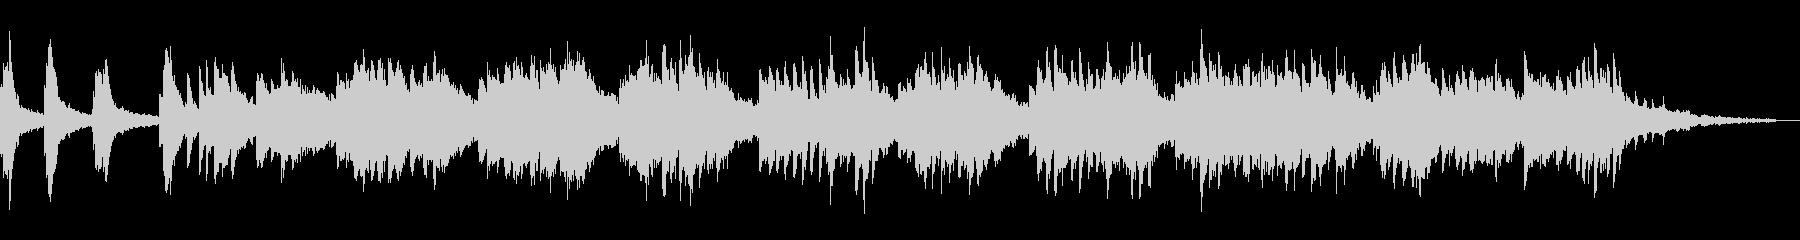 Fresh and refreshing piano jingle's unreproduced waveform